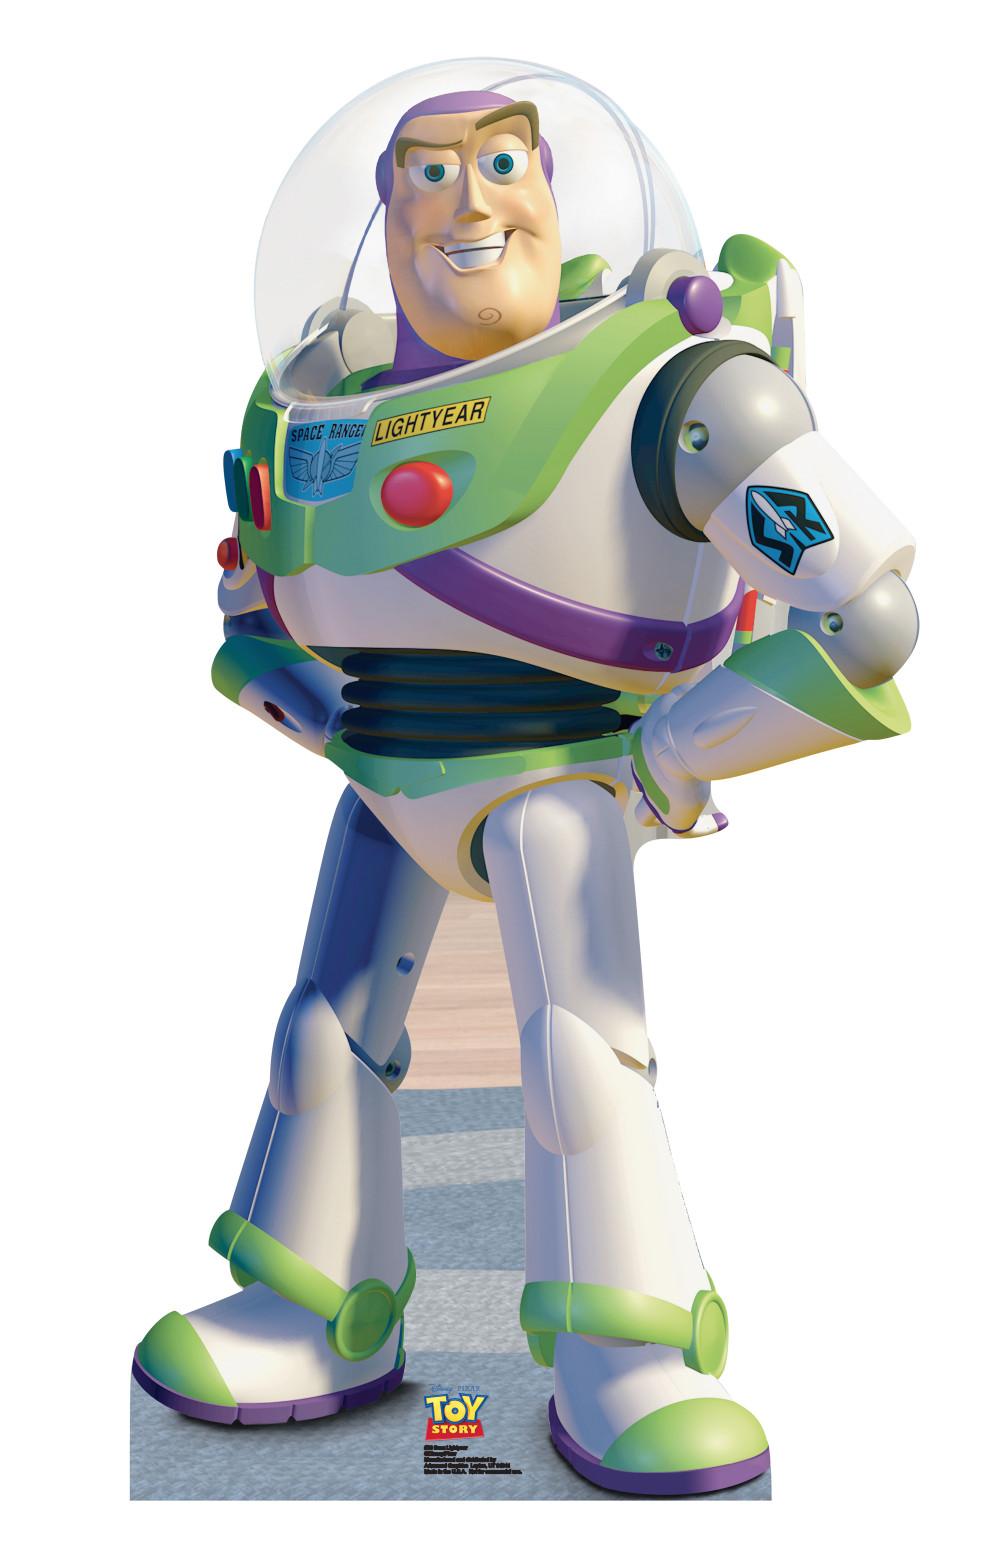 Hot Selling Custom Buzz Lightyear Action Figure Toy - Buy Custom Action  Figure,Buzz Lightyear Action Figure Toy,Action Figure Product on Alibaba com